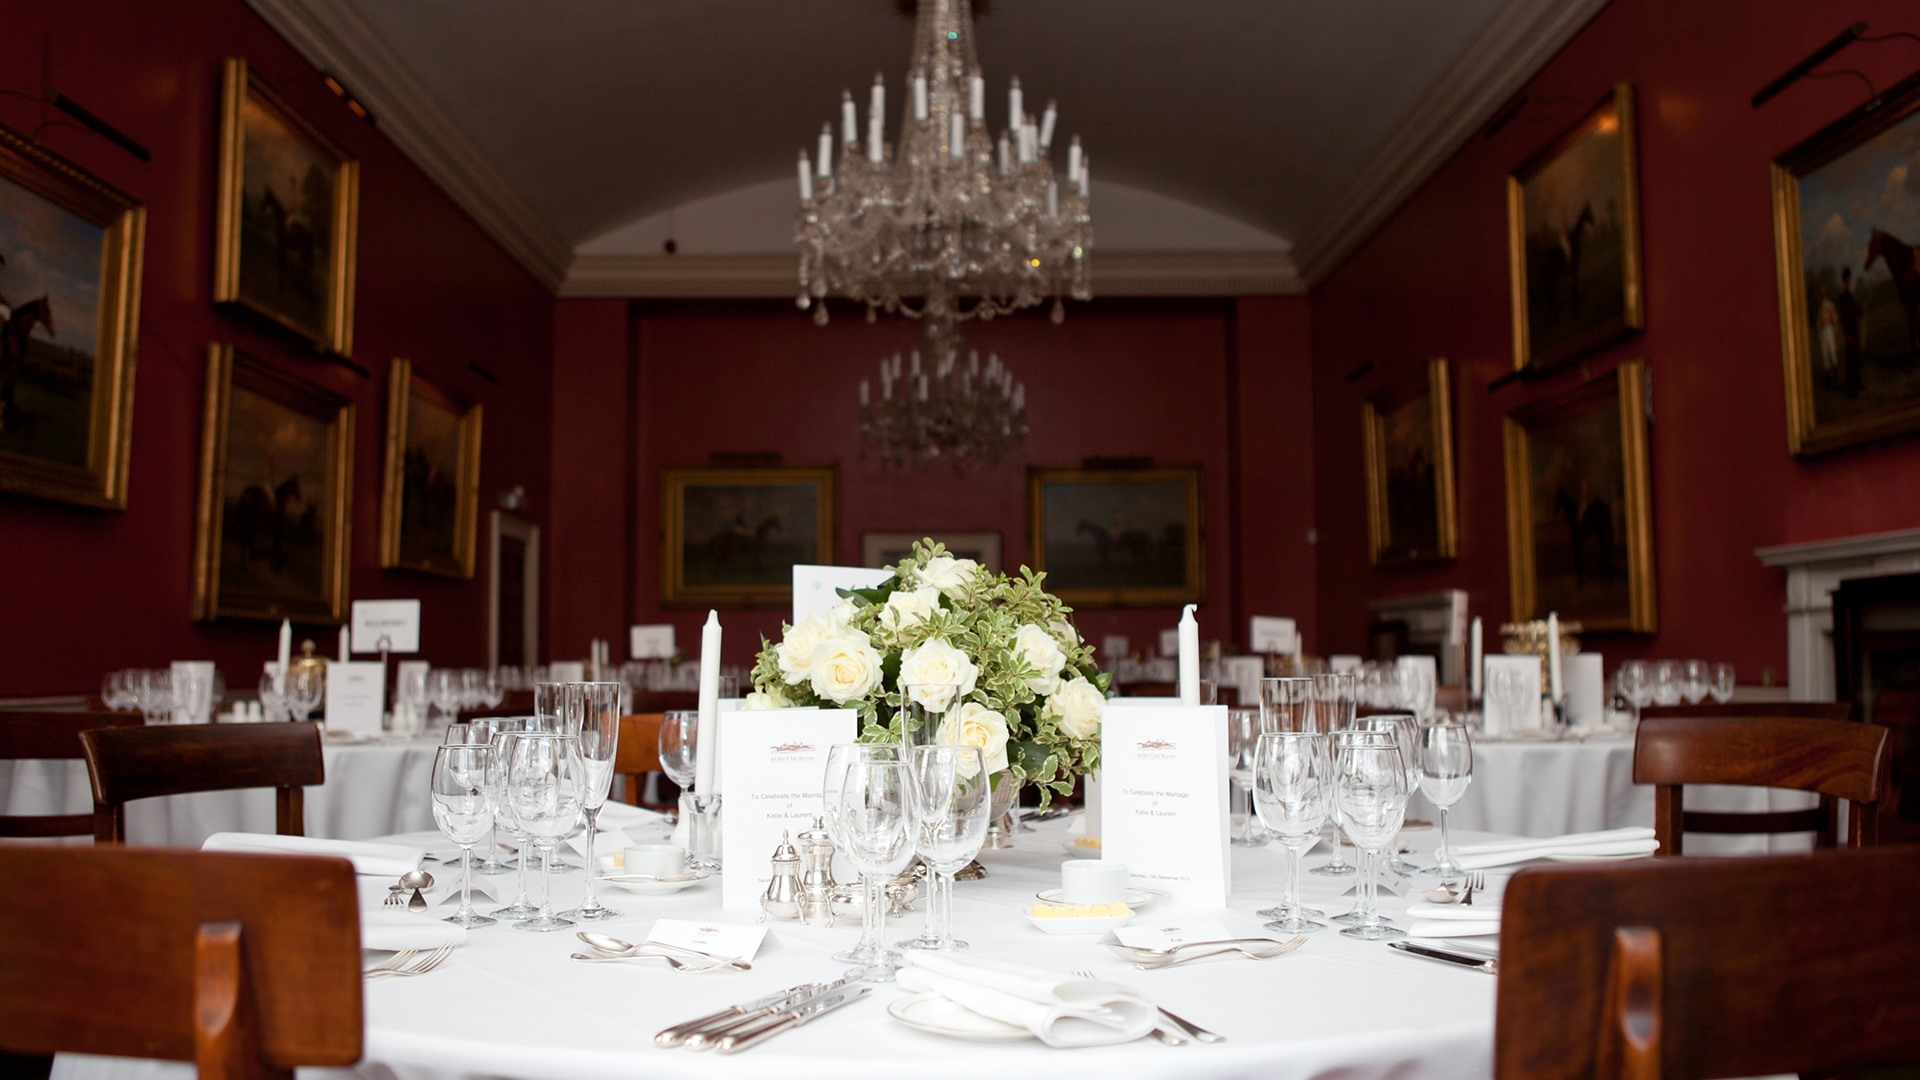 Wedding at The Jockey Club Rooms